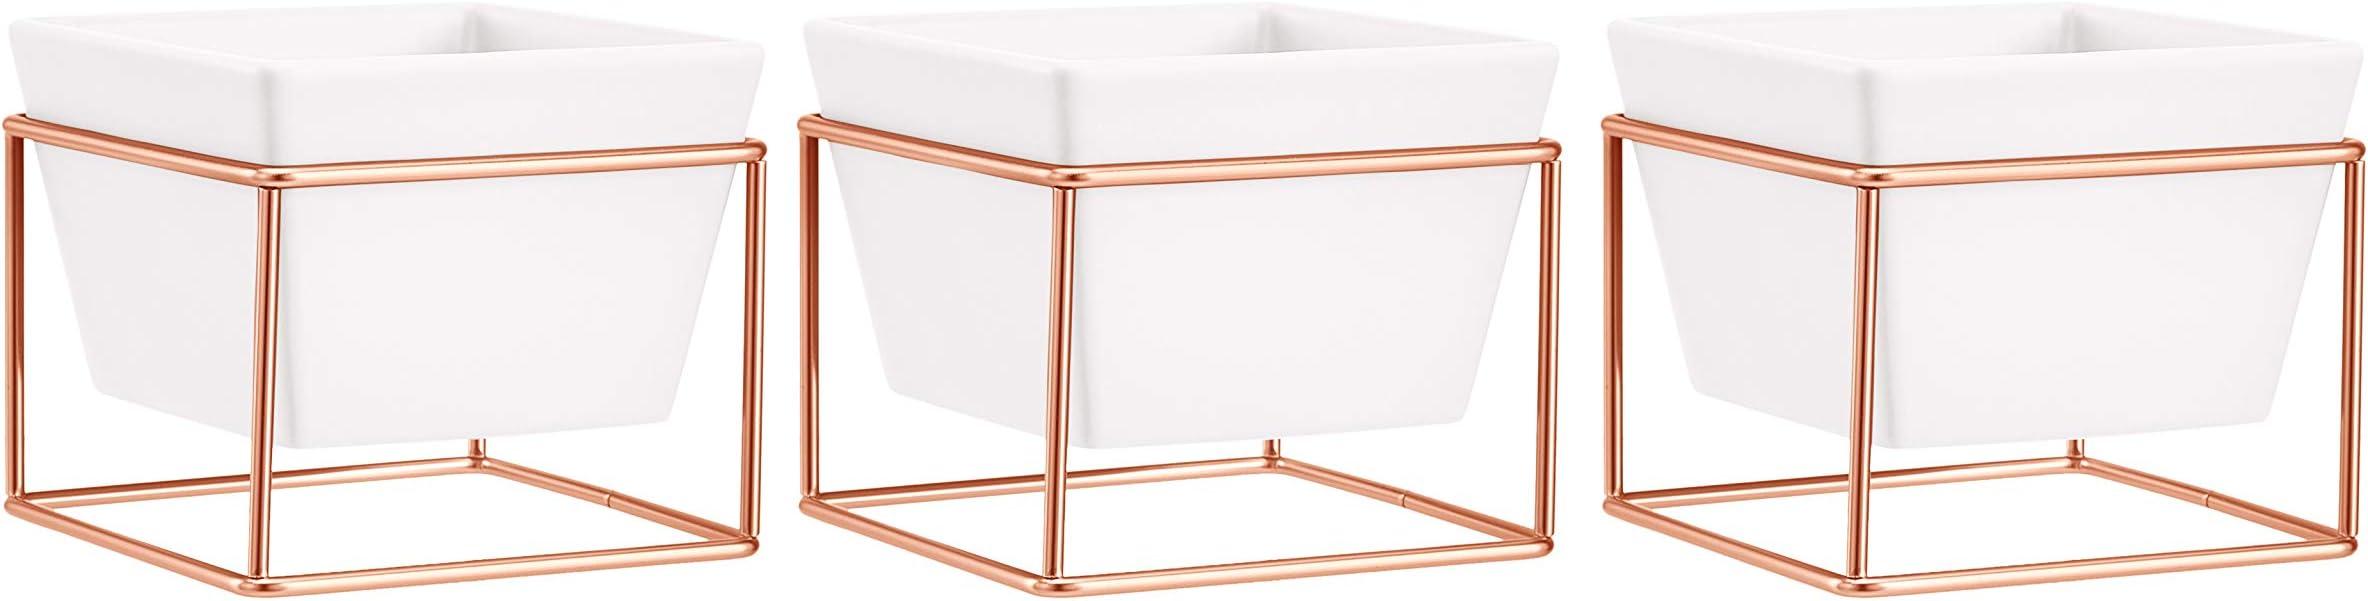 White//Copper Square Basics Tabletop Planter